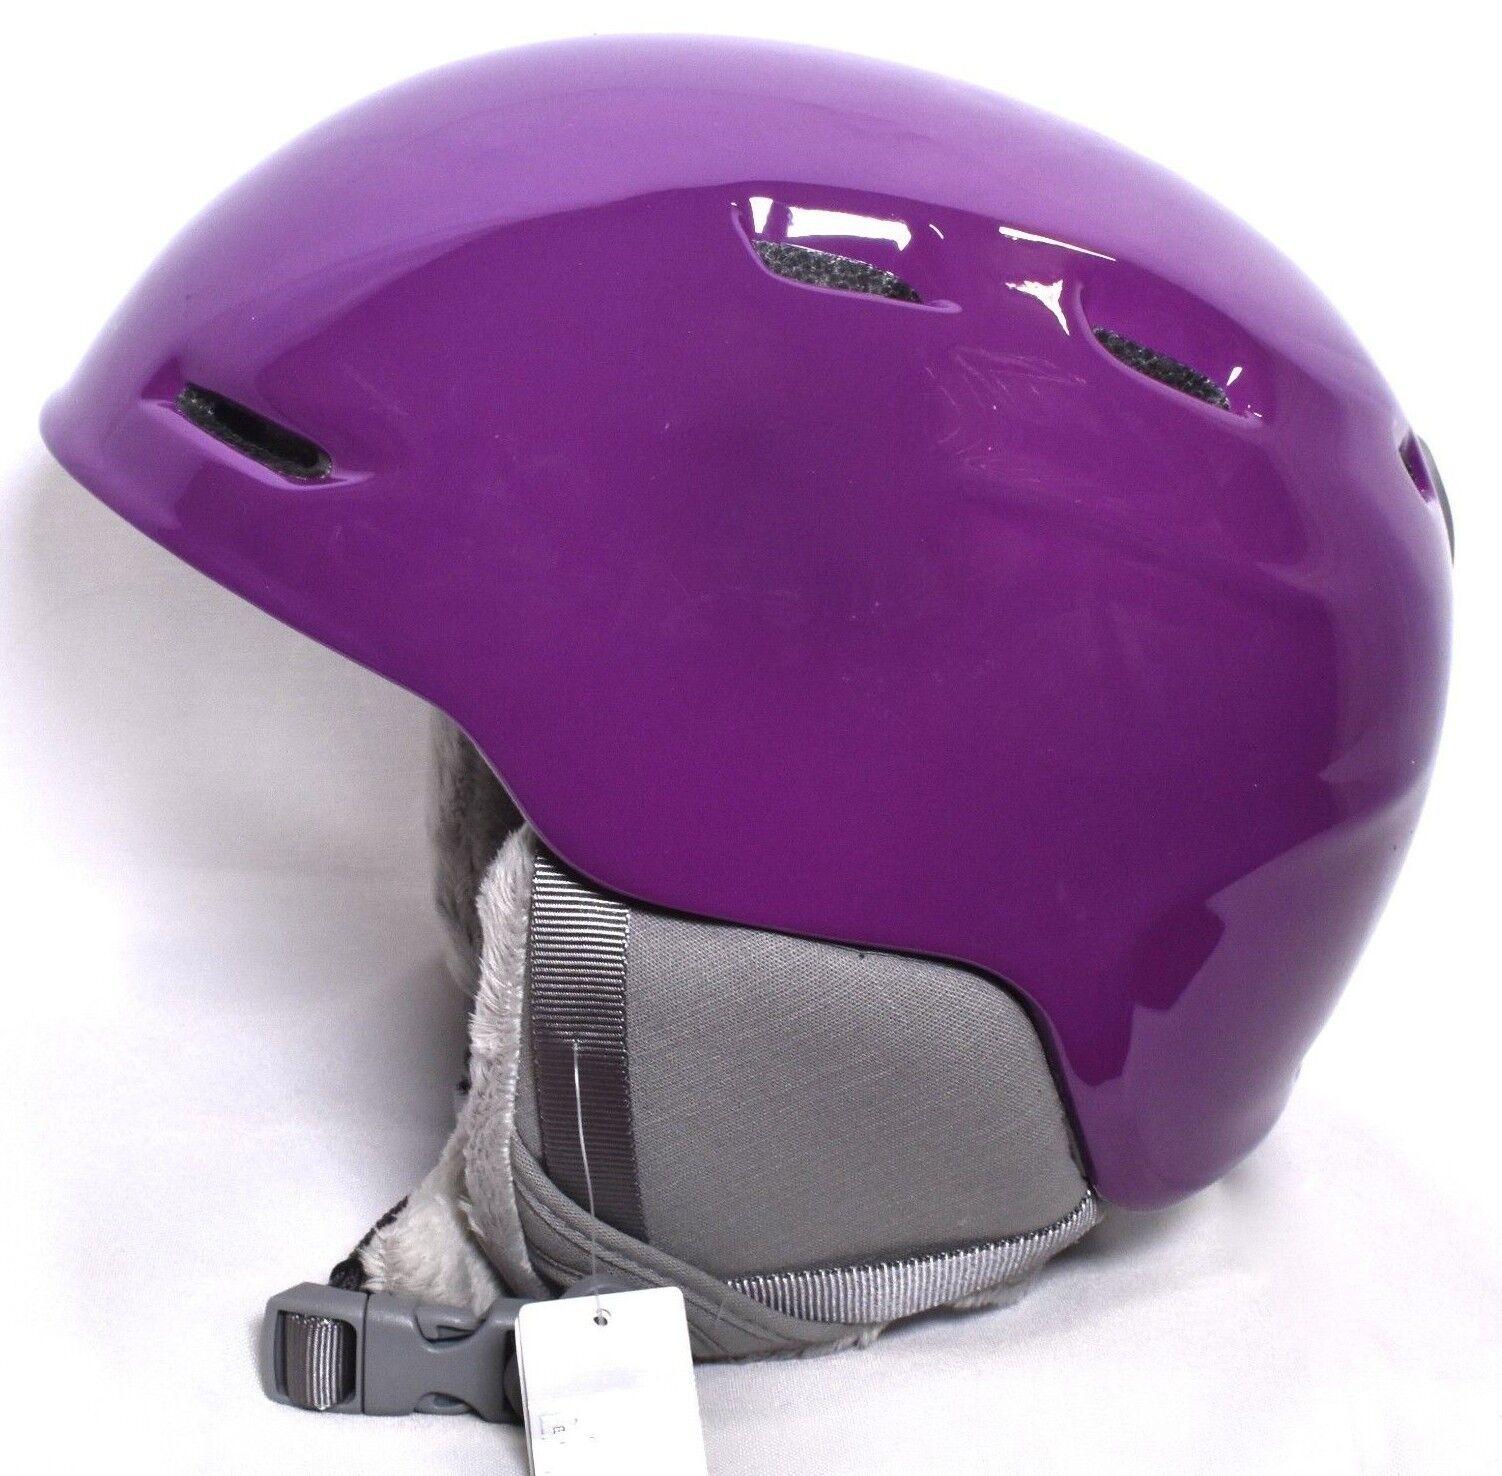 SMITH Zoom JR Junior Snow Sports Helmet (Youth Sz M 53-58 cm) Monarch Purple NEW